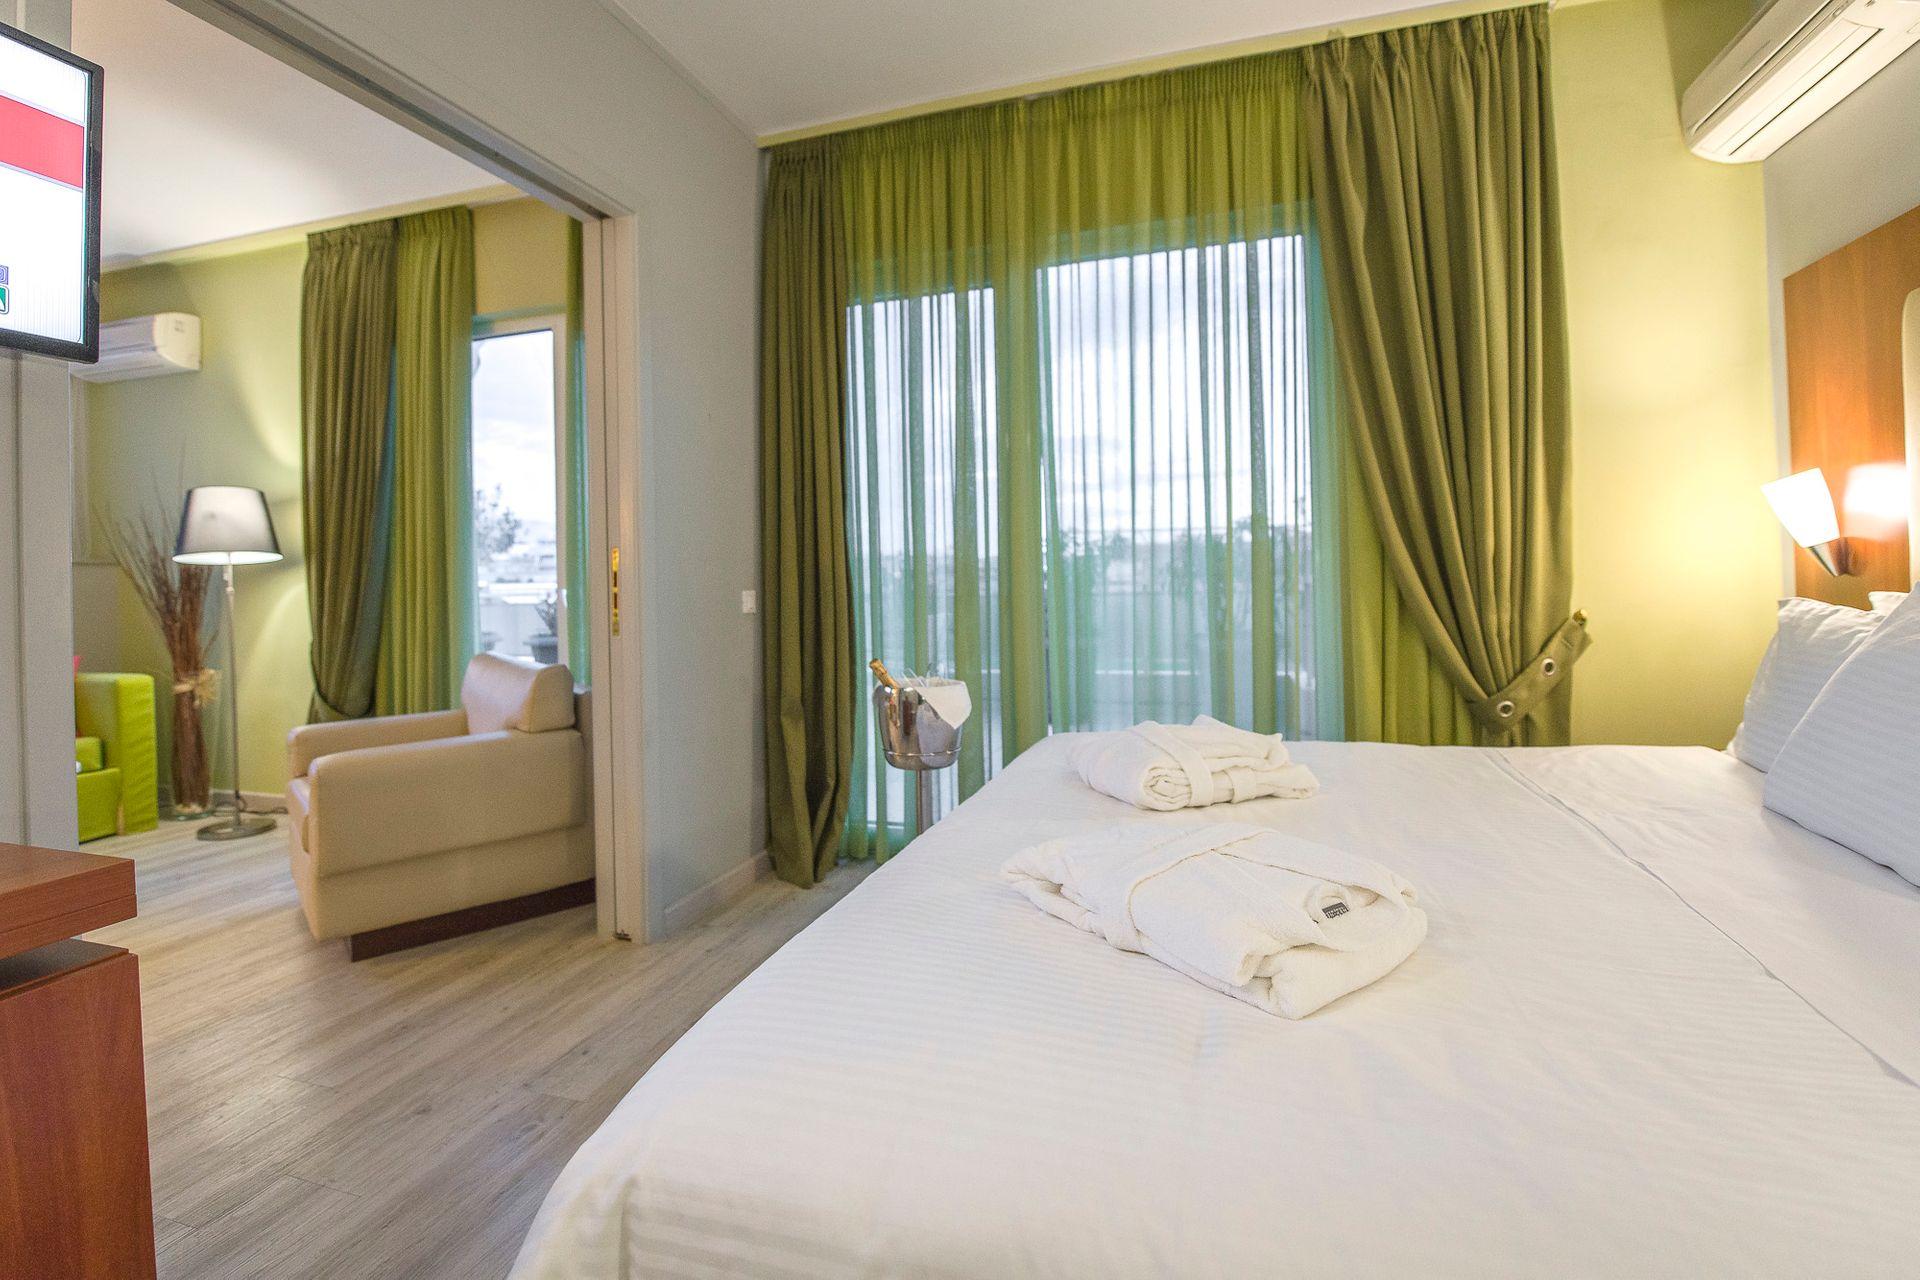 4* Polis Grand Hotel - Αθήνα ✦ 2 Ημέρες (1 Διανυκτέρευση)